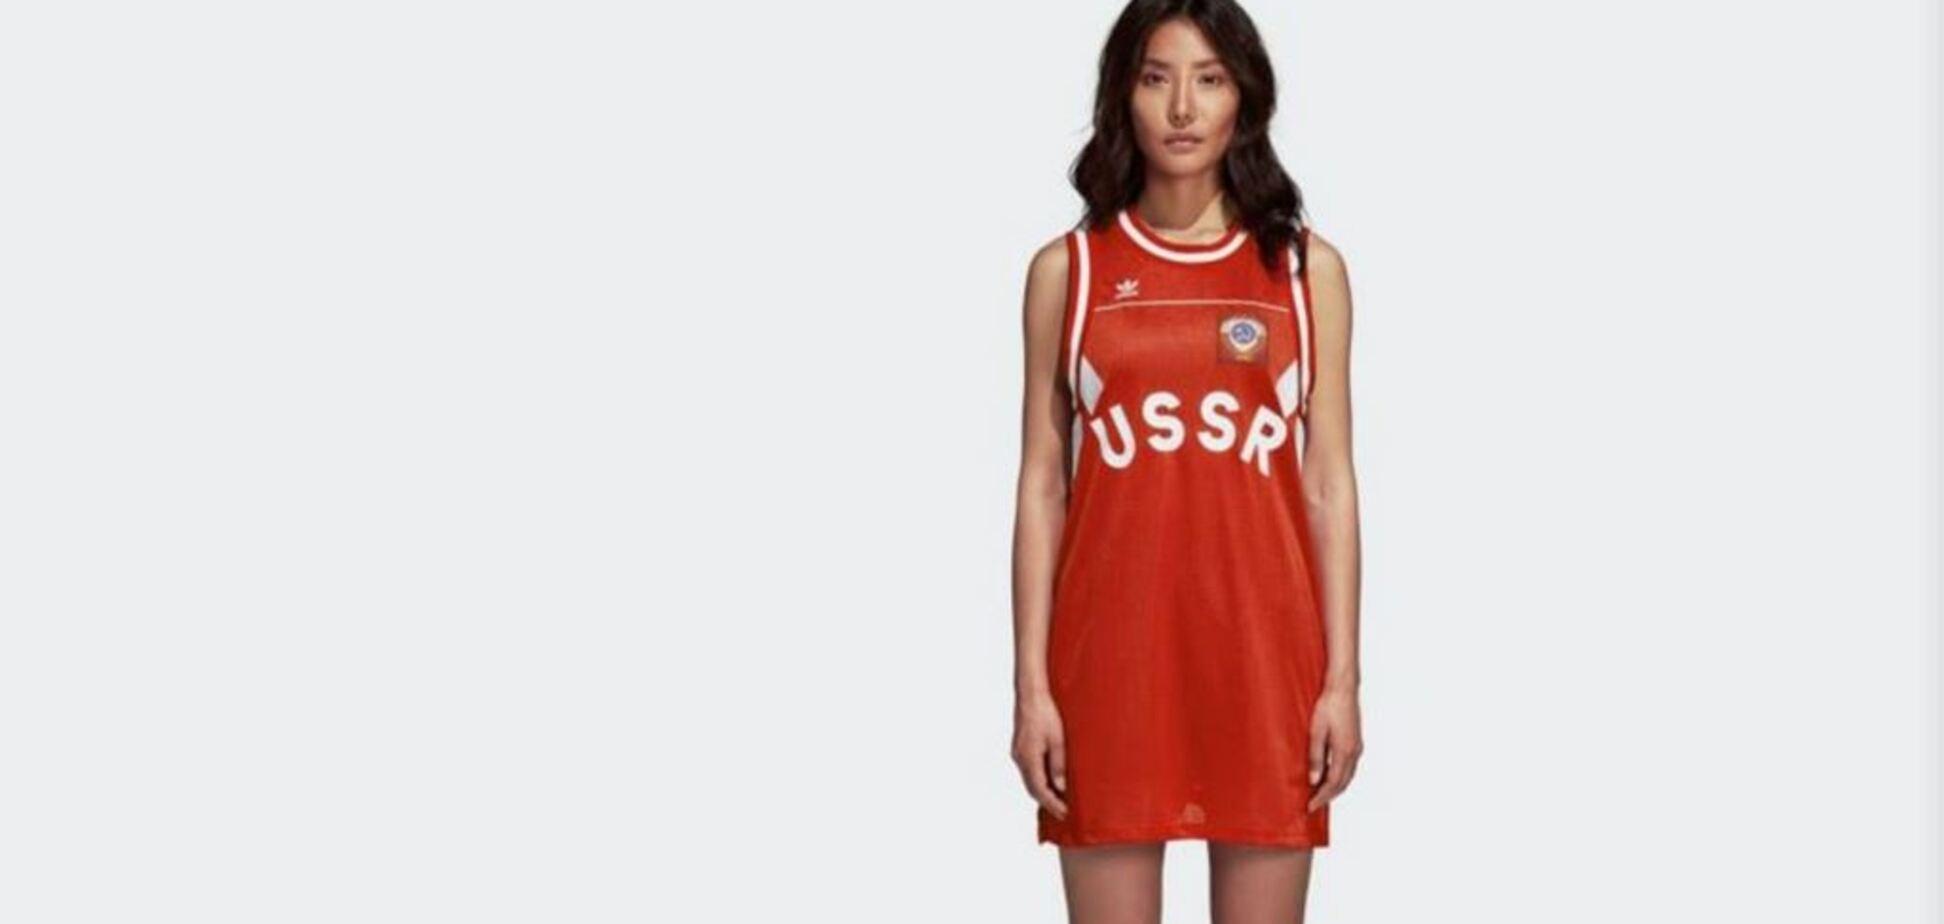 Adidas потрапив у скандал через одягу родом з СРСР